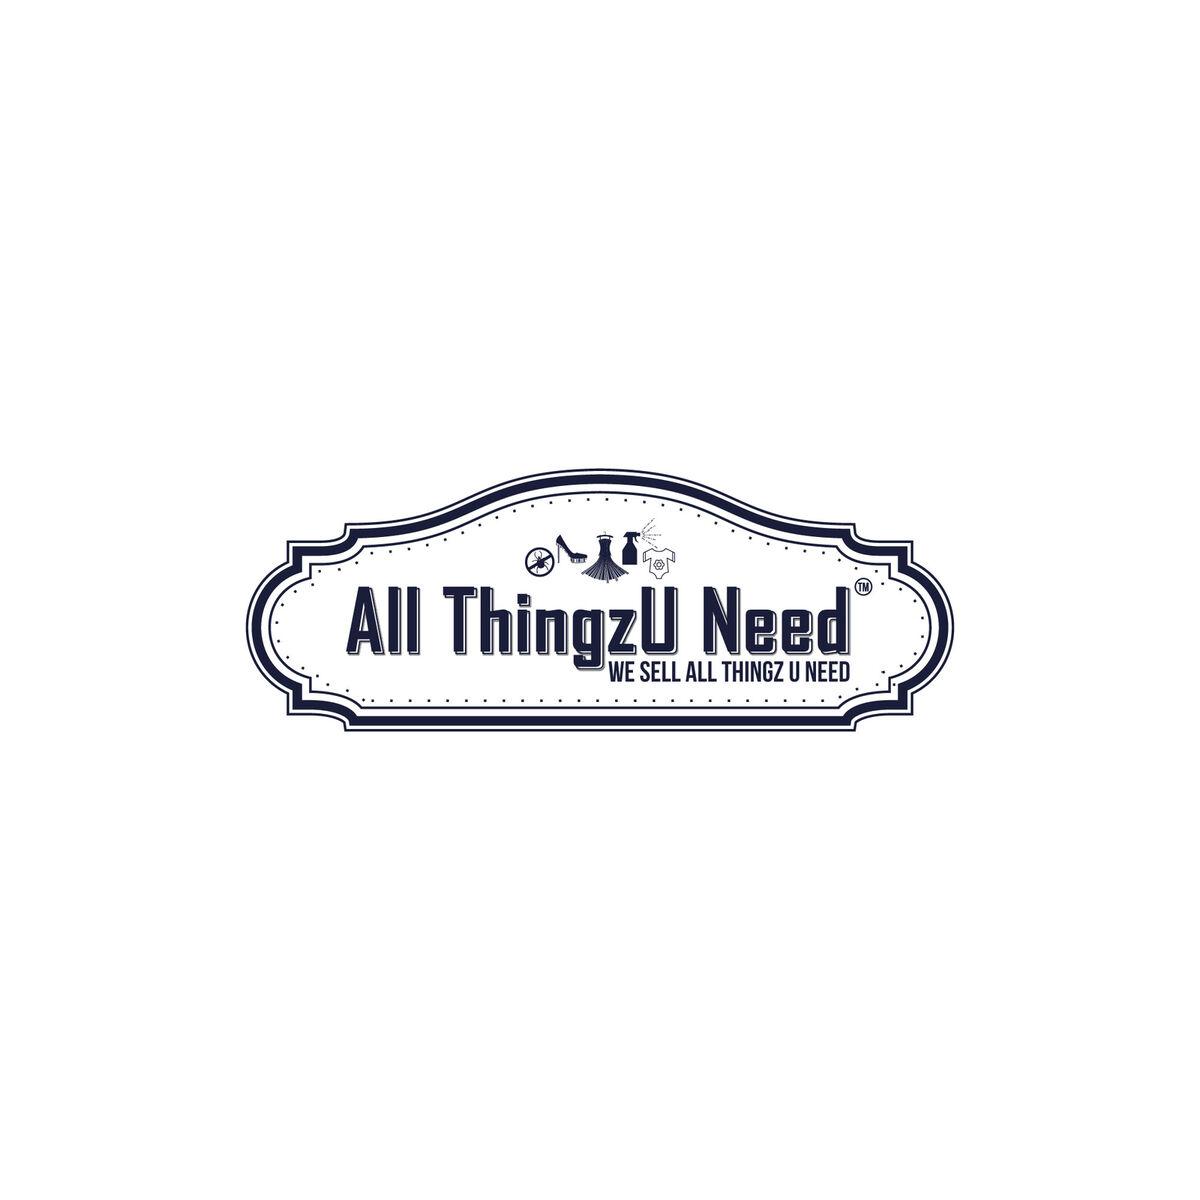 All Thingz U Need